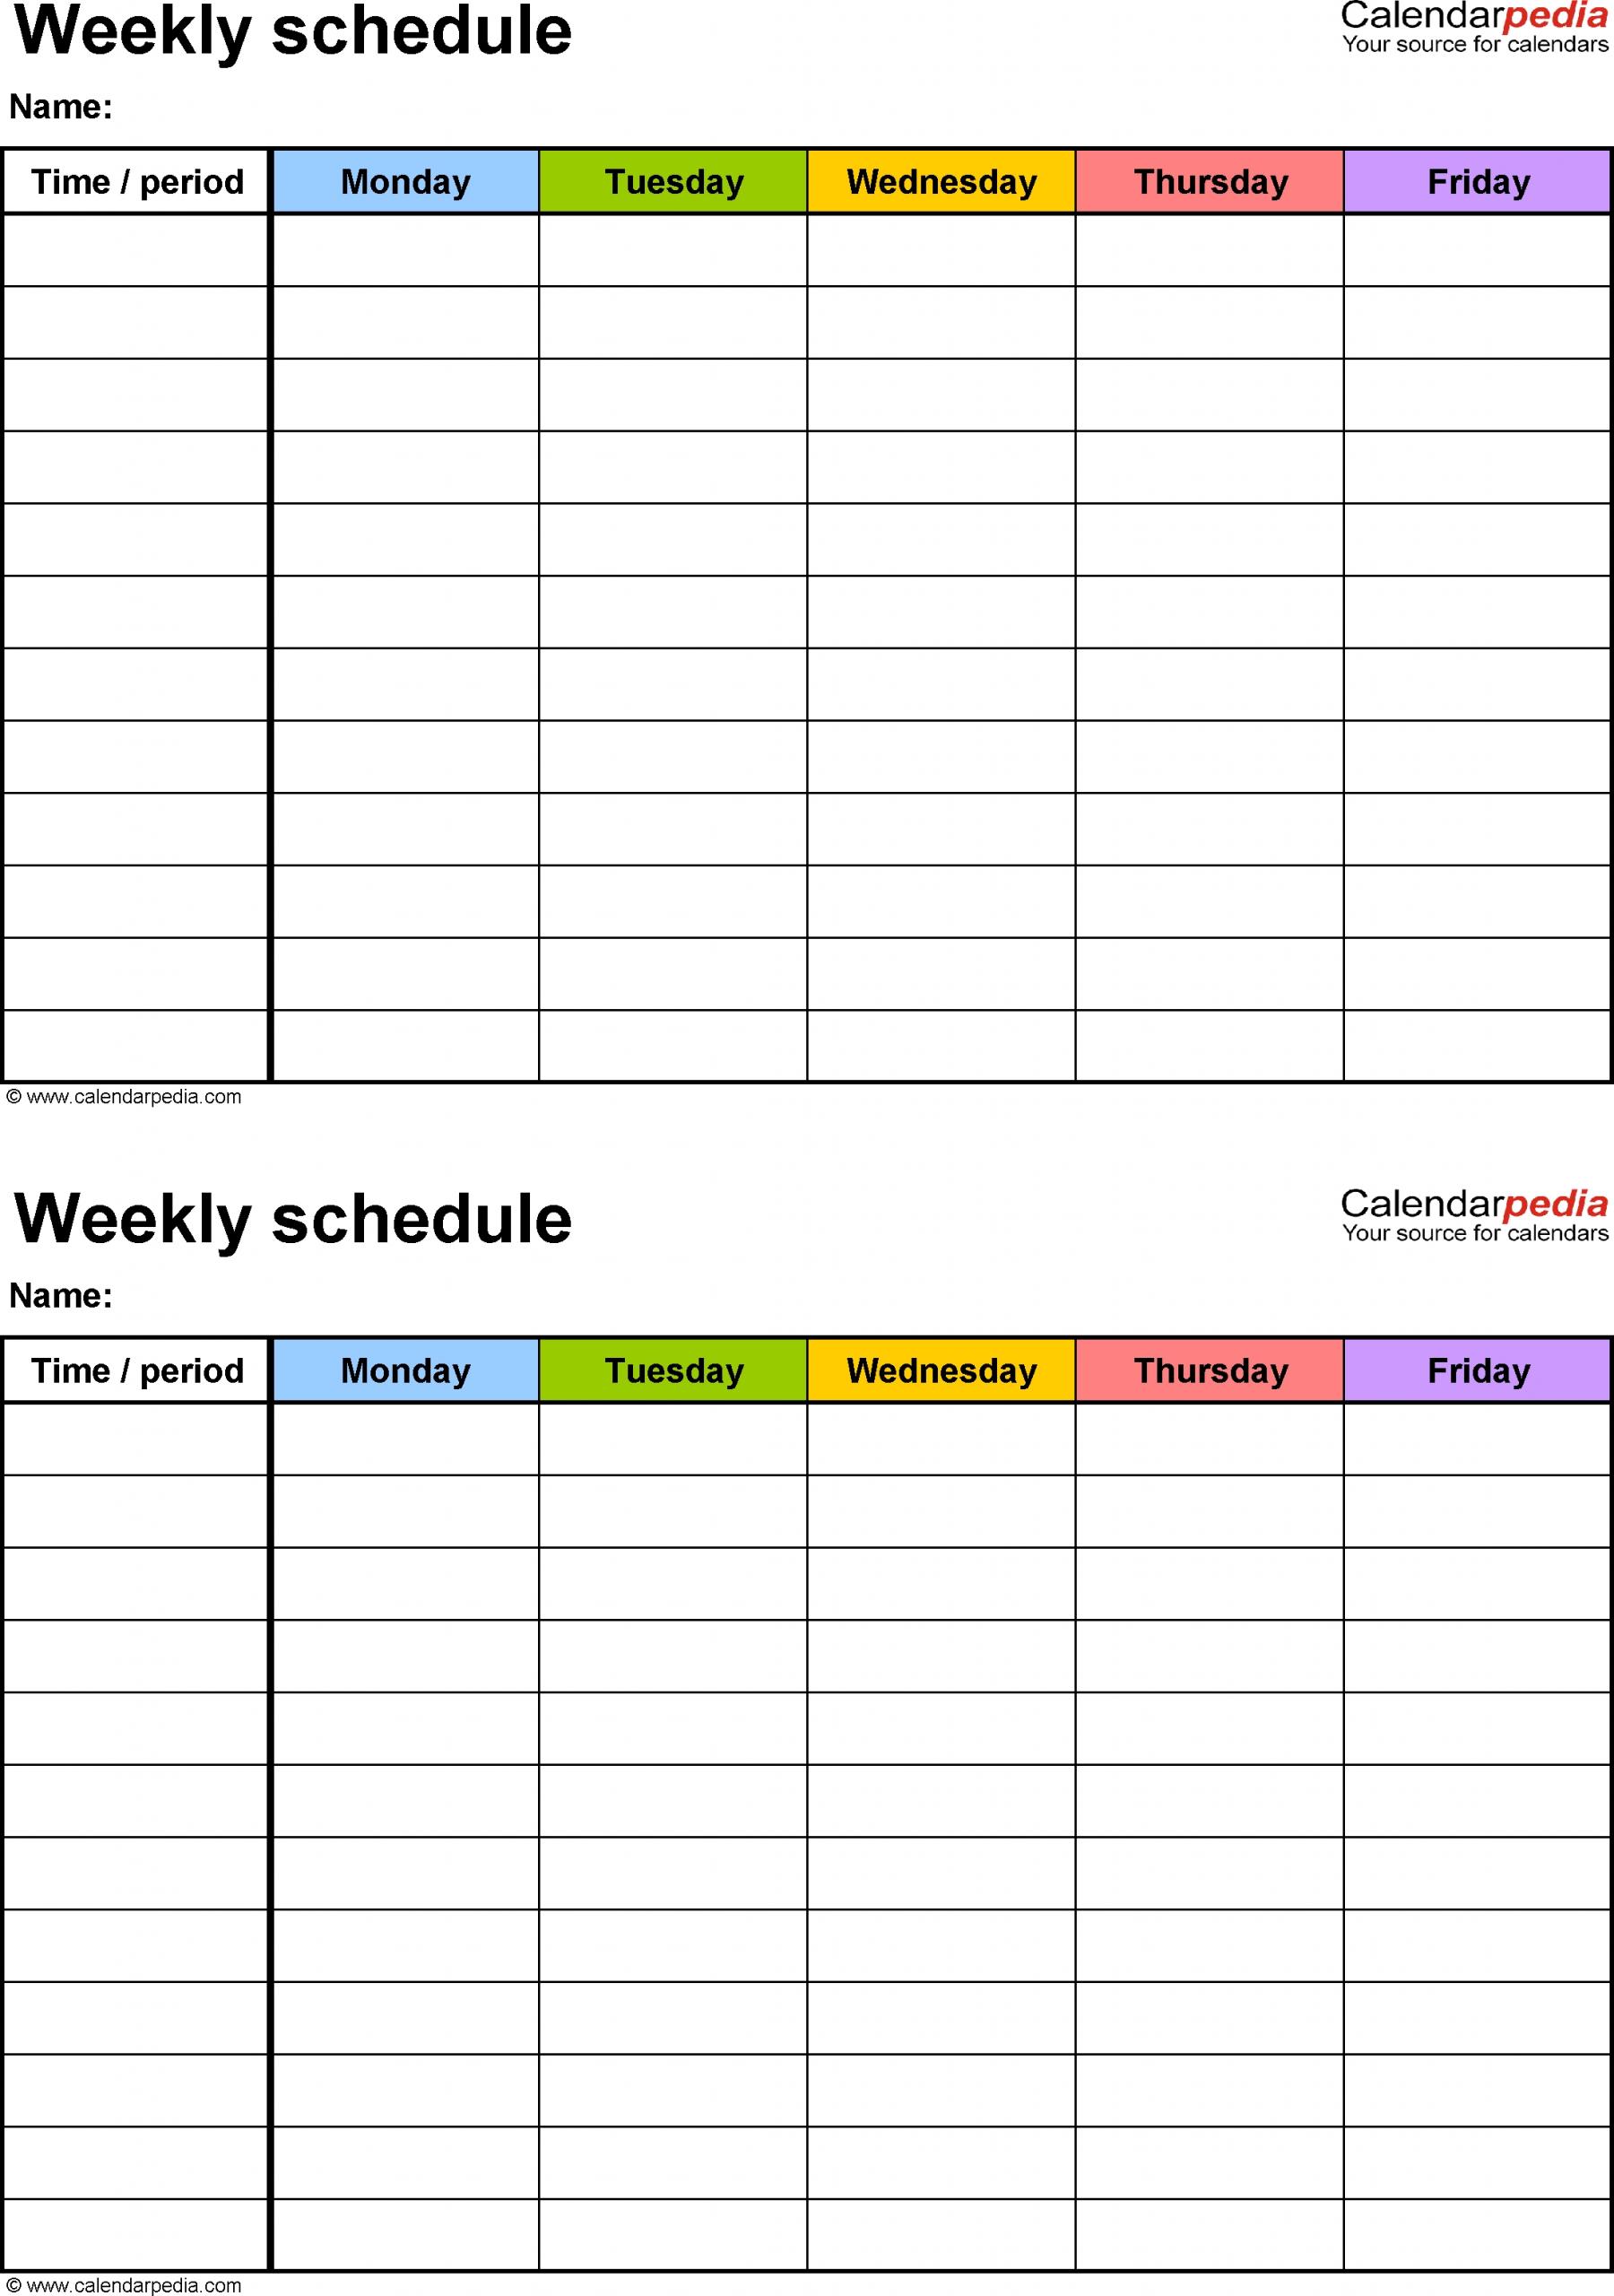 Get Calendar Online Editable Daily Time